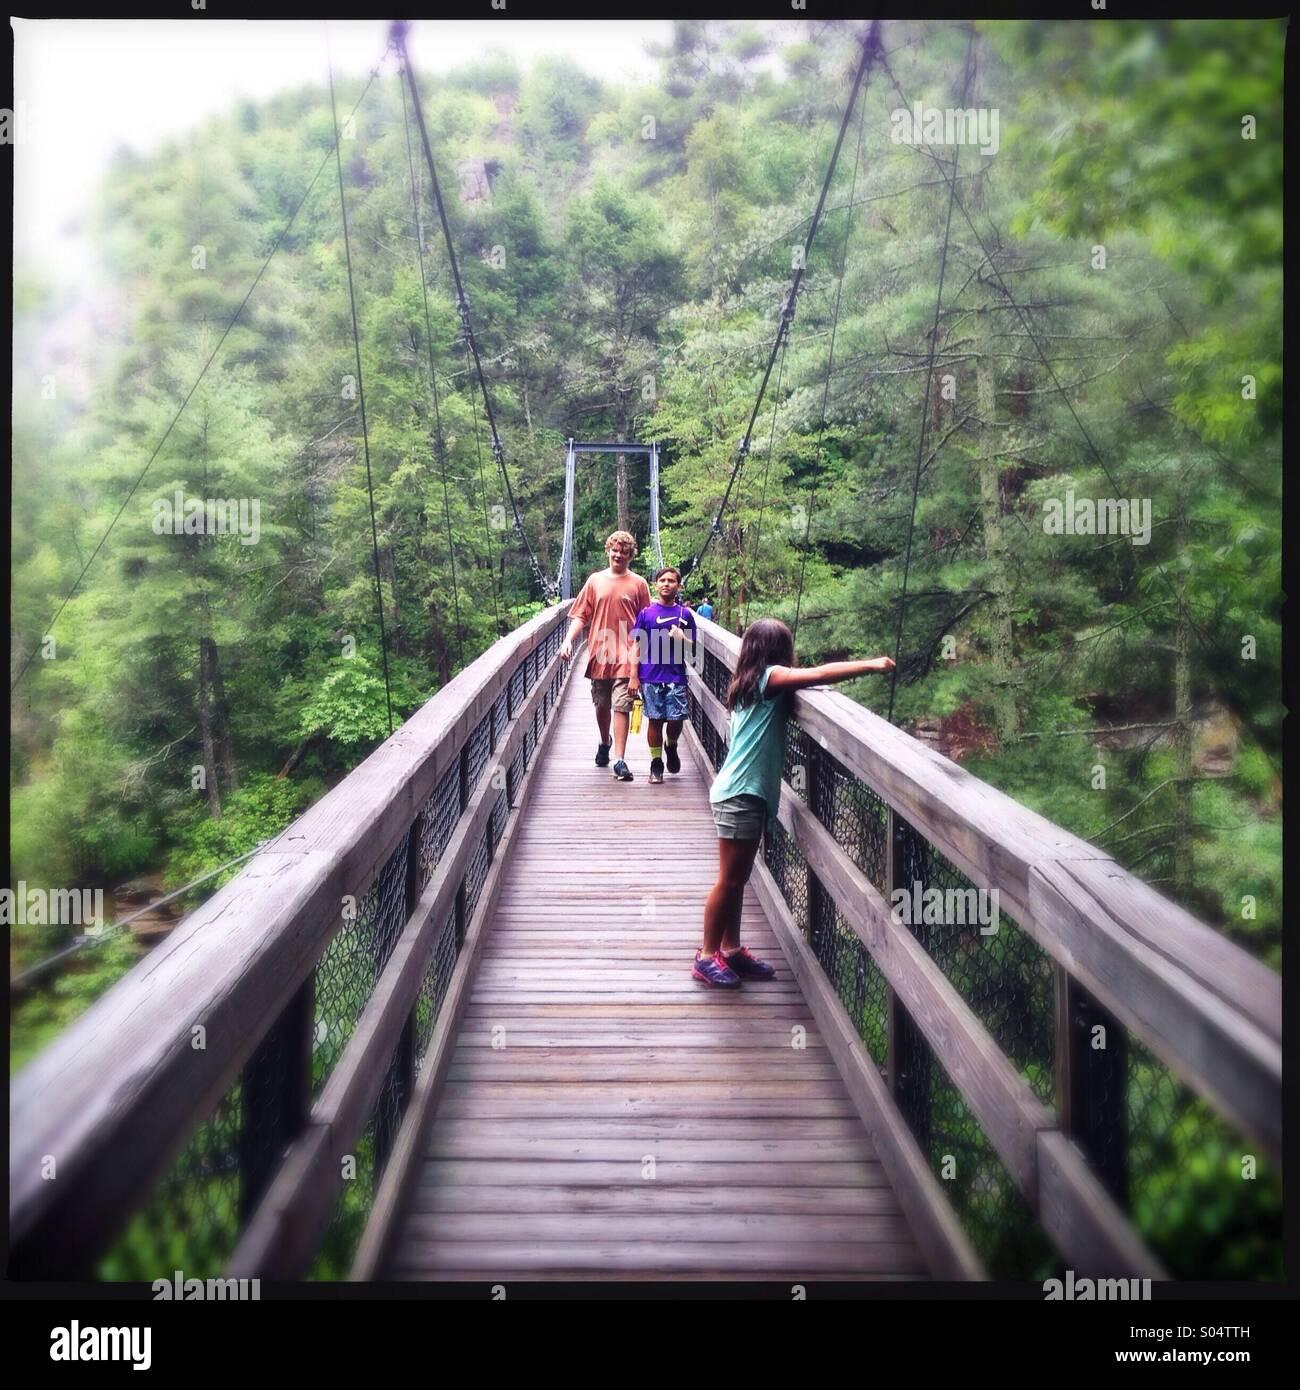 Tallulah gorge park in Georgia, USA - Stock Image